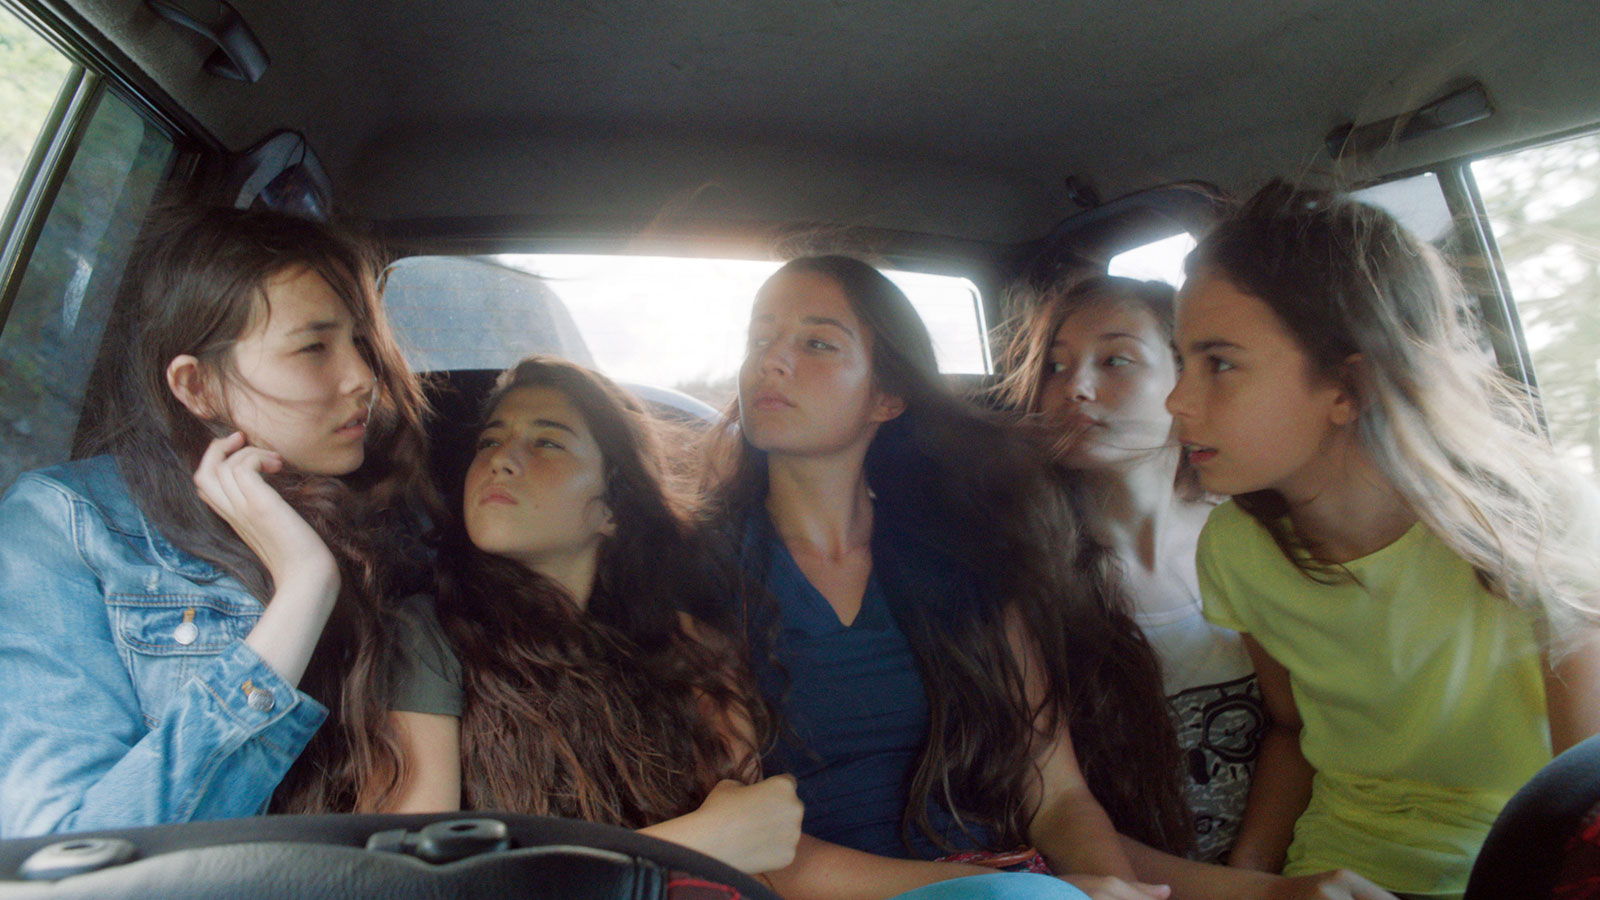 Mustang : Photo Doga Zeynep Doguslu, Elit Iscan, Günes Nezihe Sensoy, Ilayda Akdogan, Tugba Sunguroglu